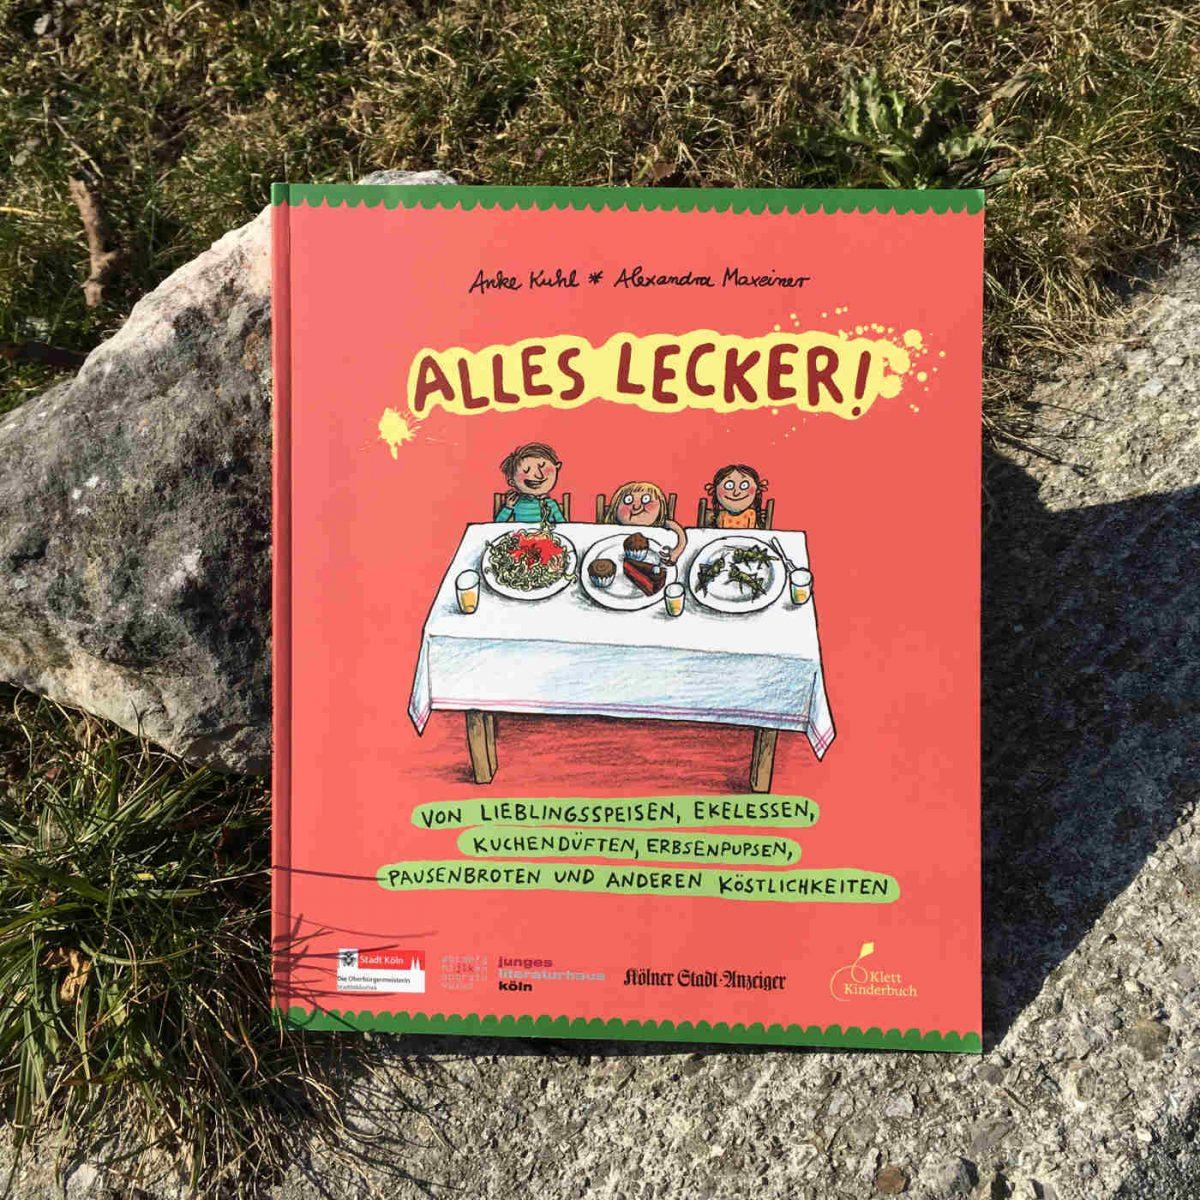 Anke Kuhl und Alexandra Maxeiner: Alles lecker!